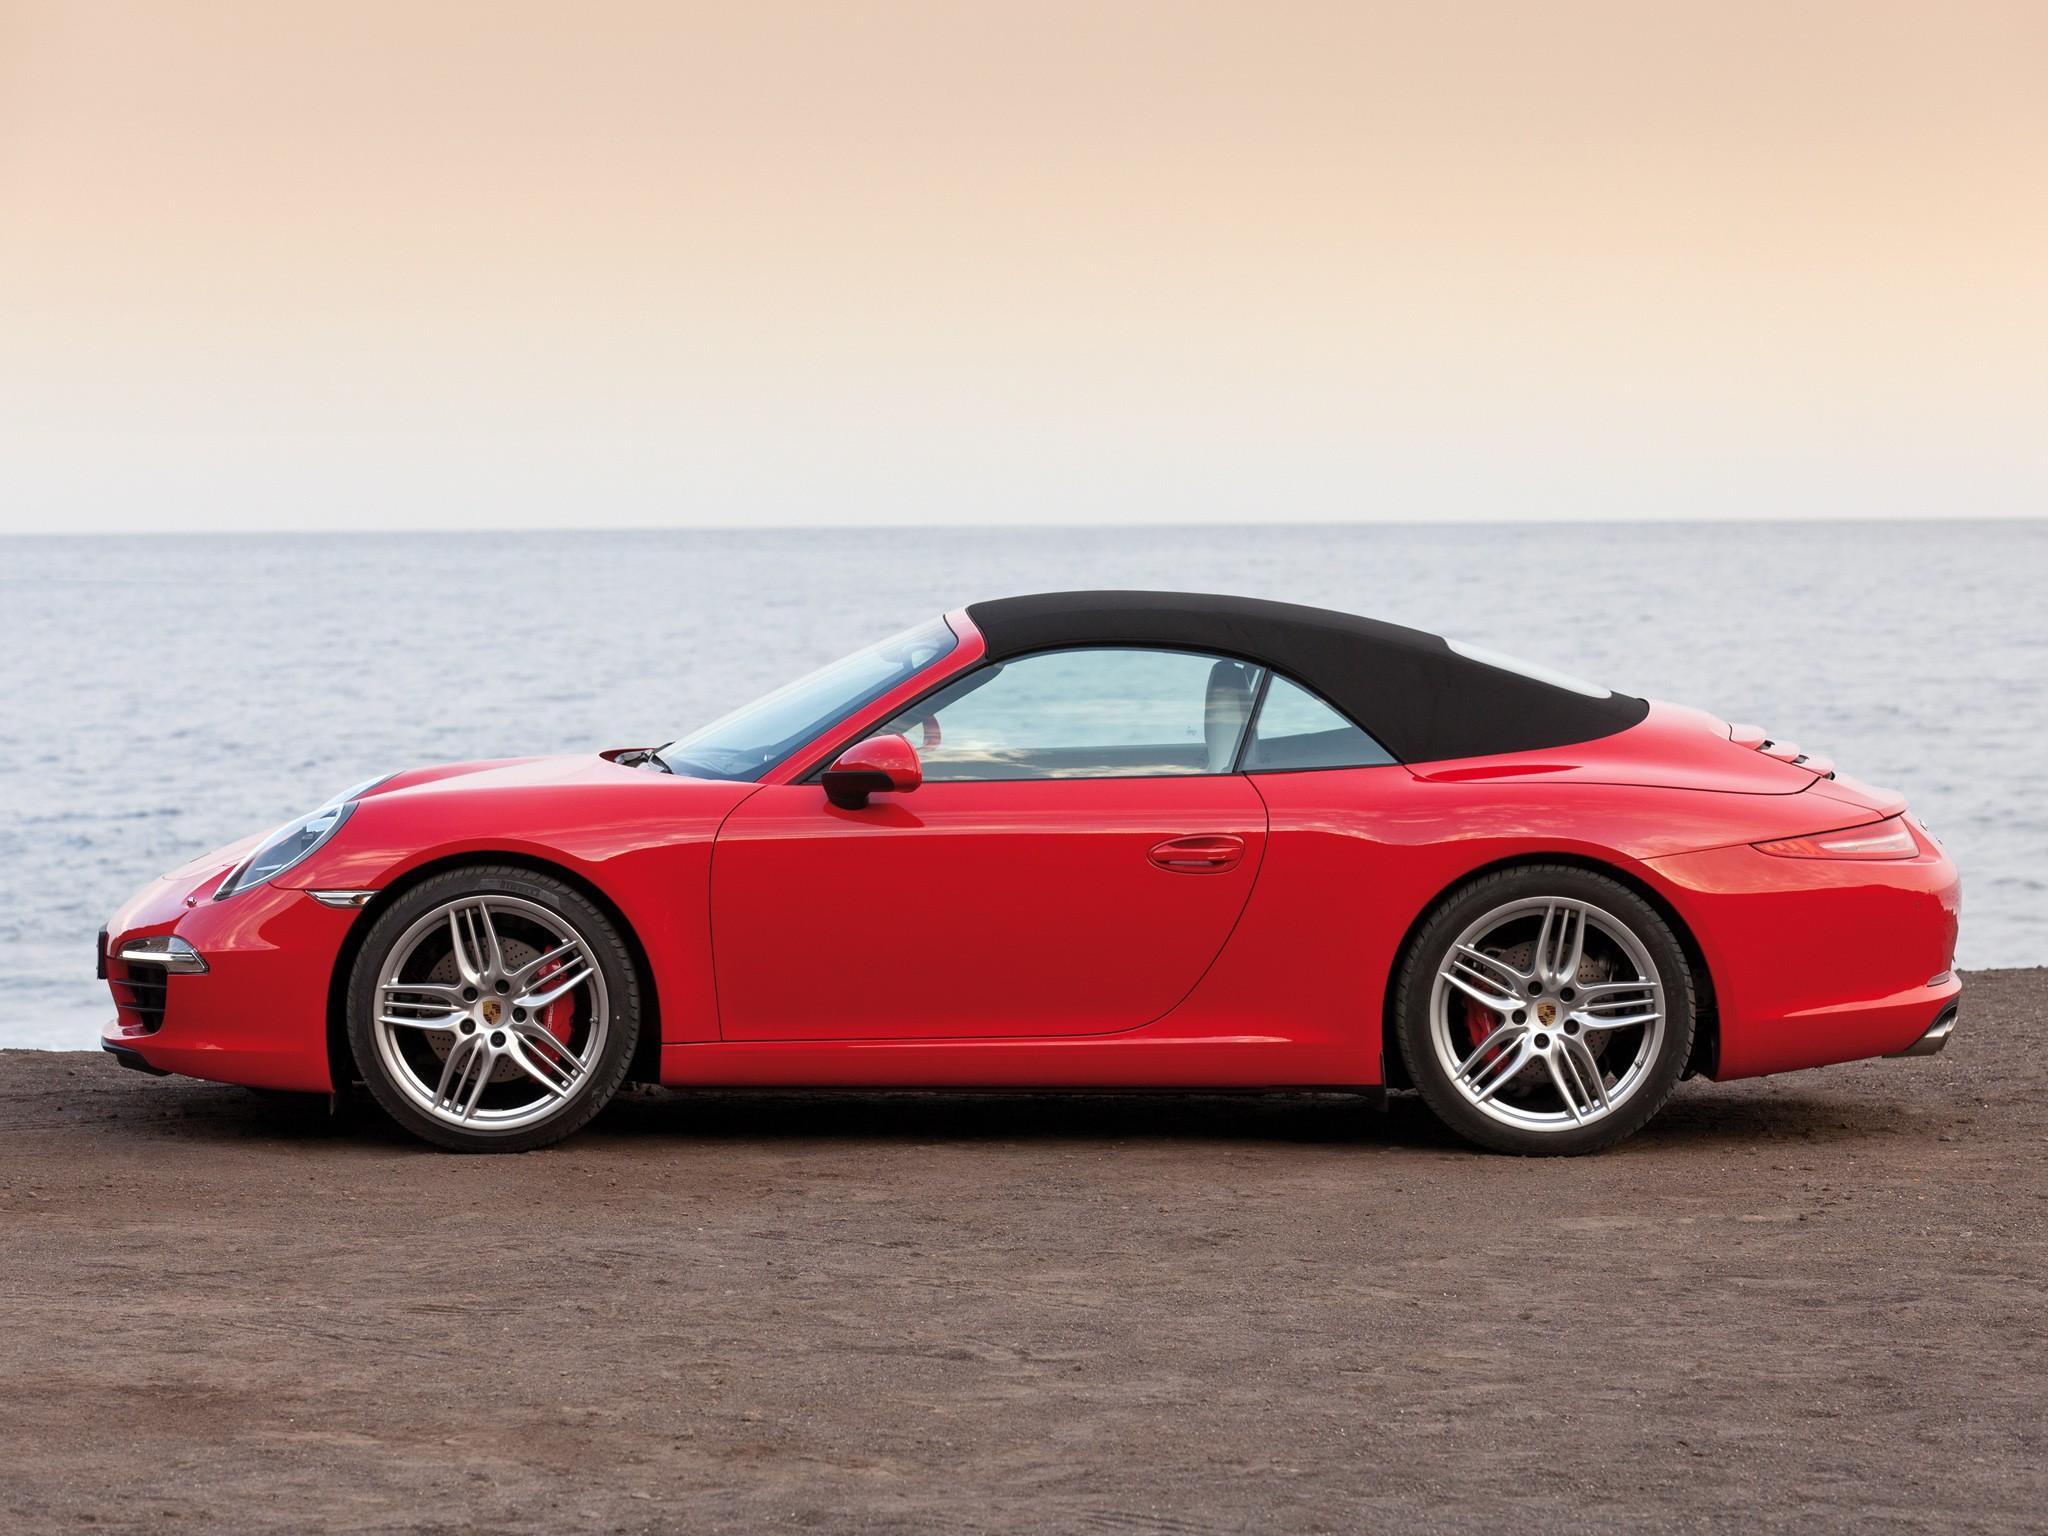 Porsche 911 Carrera S Cabriolet 991 2012 2013 2014